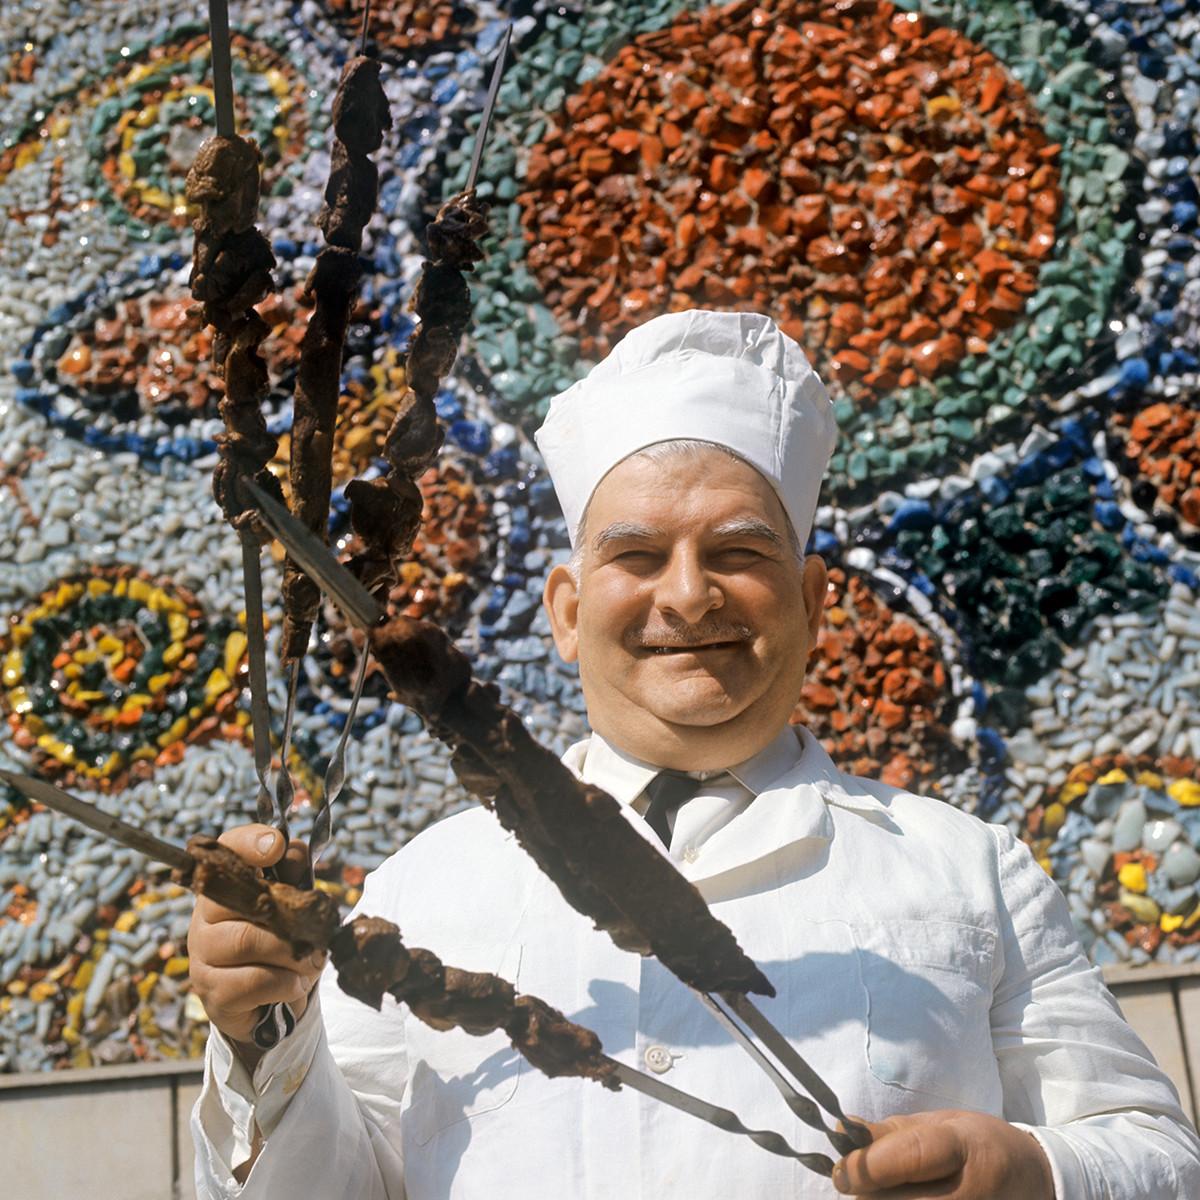 Un cuoco con in mano degli shashlyk, Repubblica Socialista Sovietica Georgiana, 1971